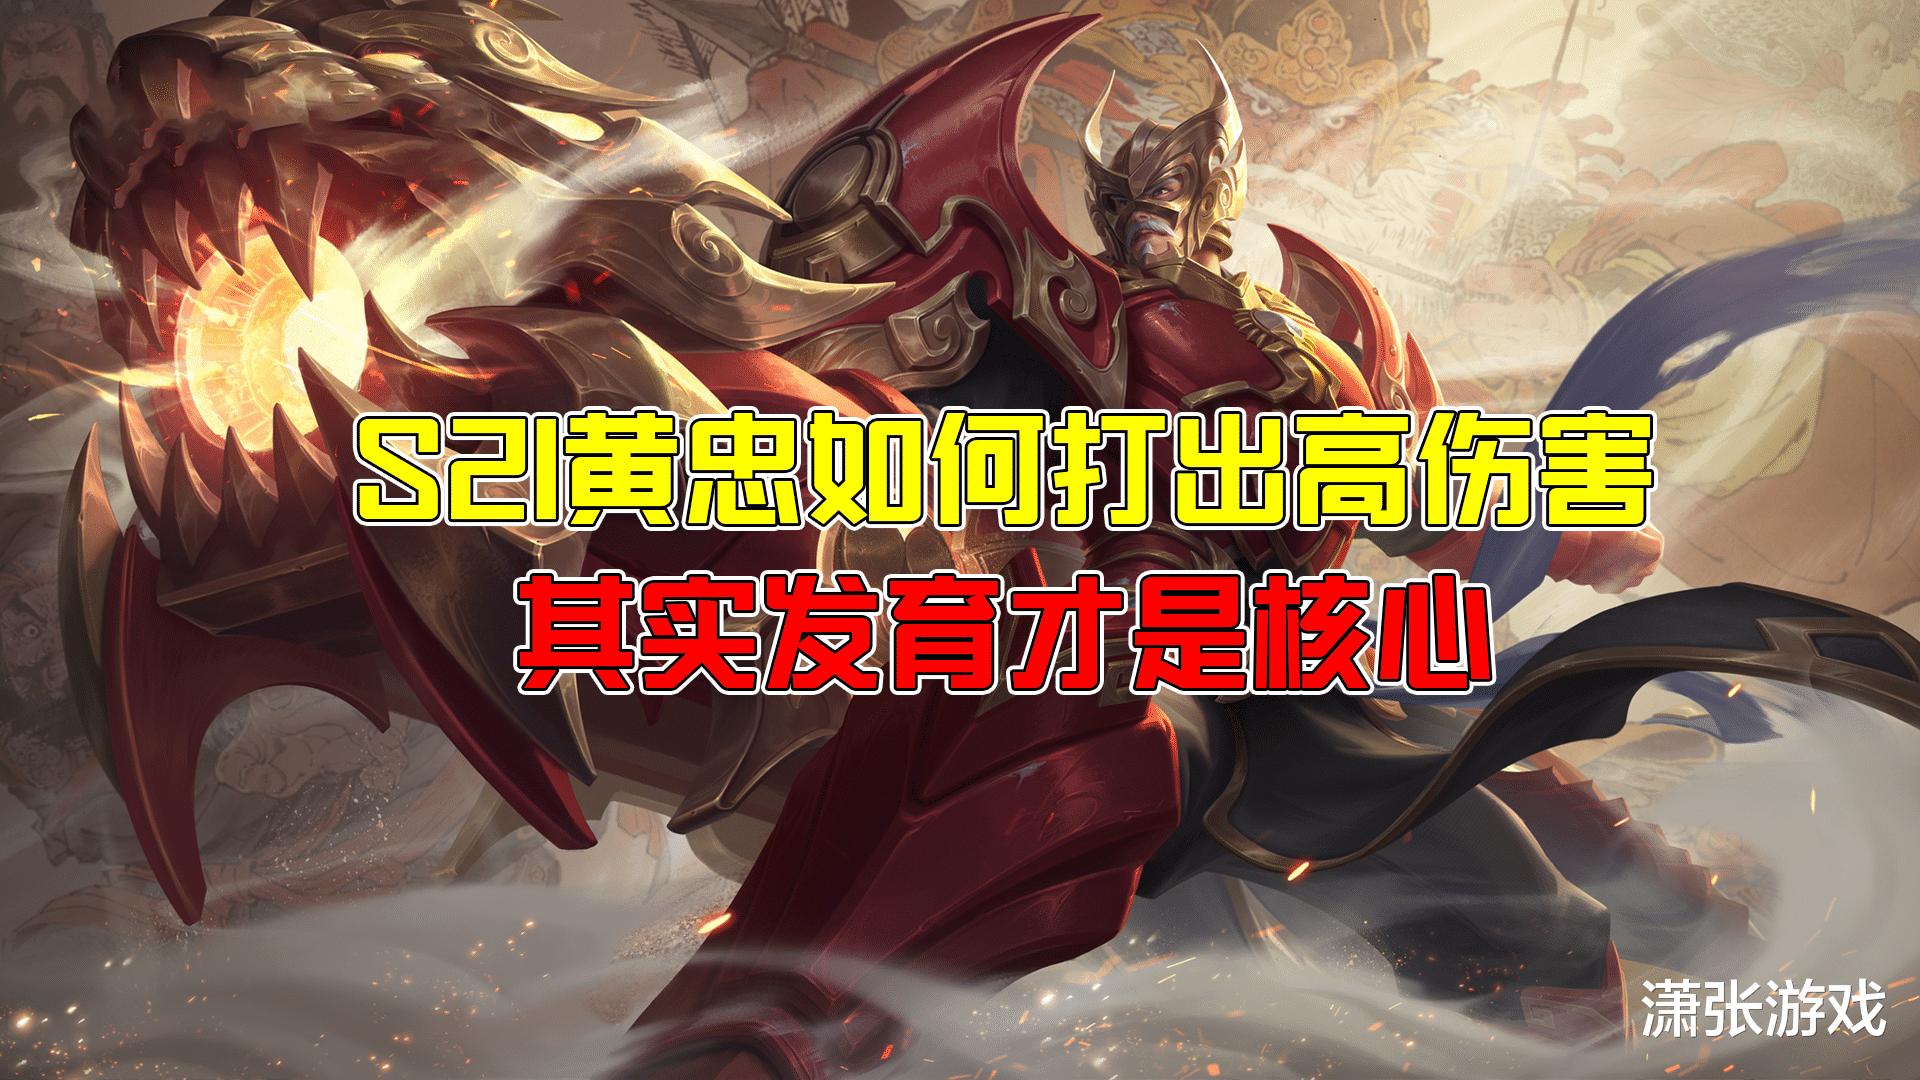 yuoxi_王者荣耀:S21如何用黄忠打出高伤害?其实细节全在发育里面!